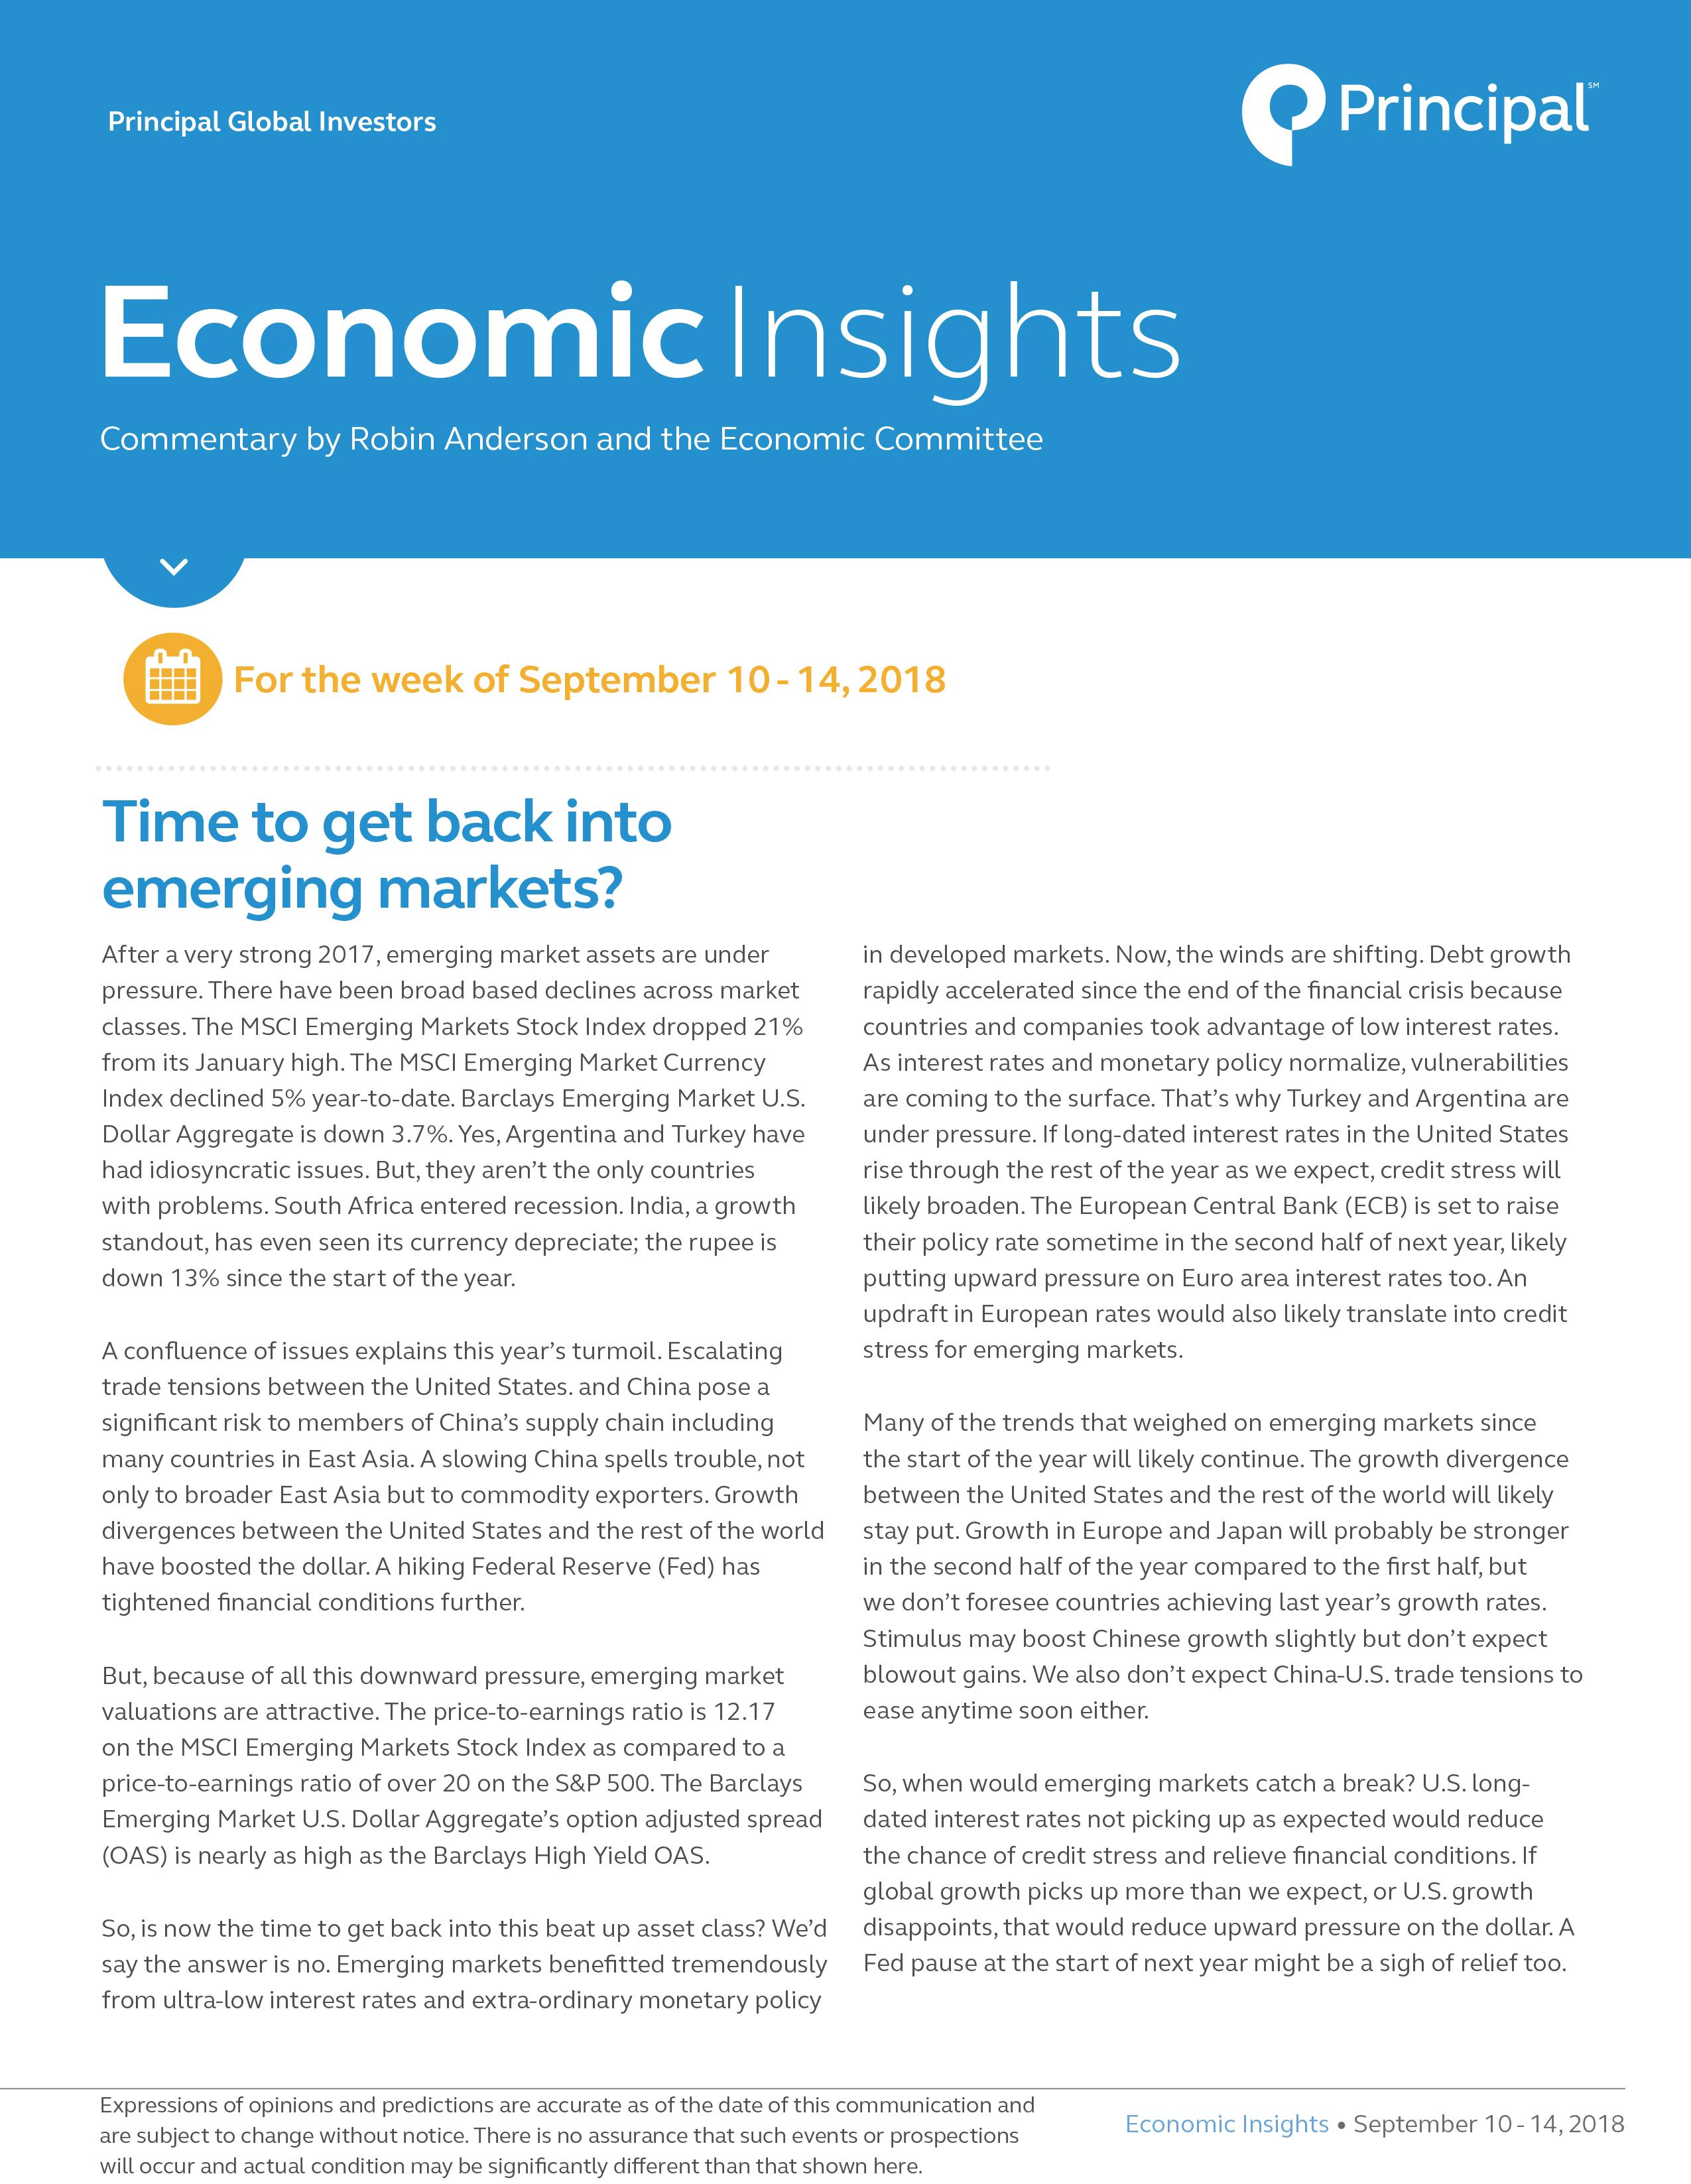 Economic Insights for September 10 - 14